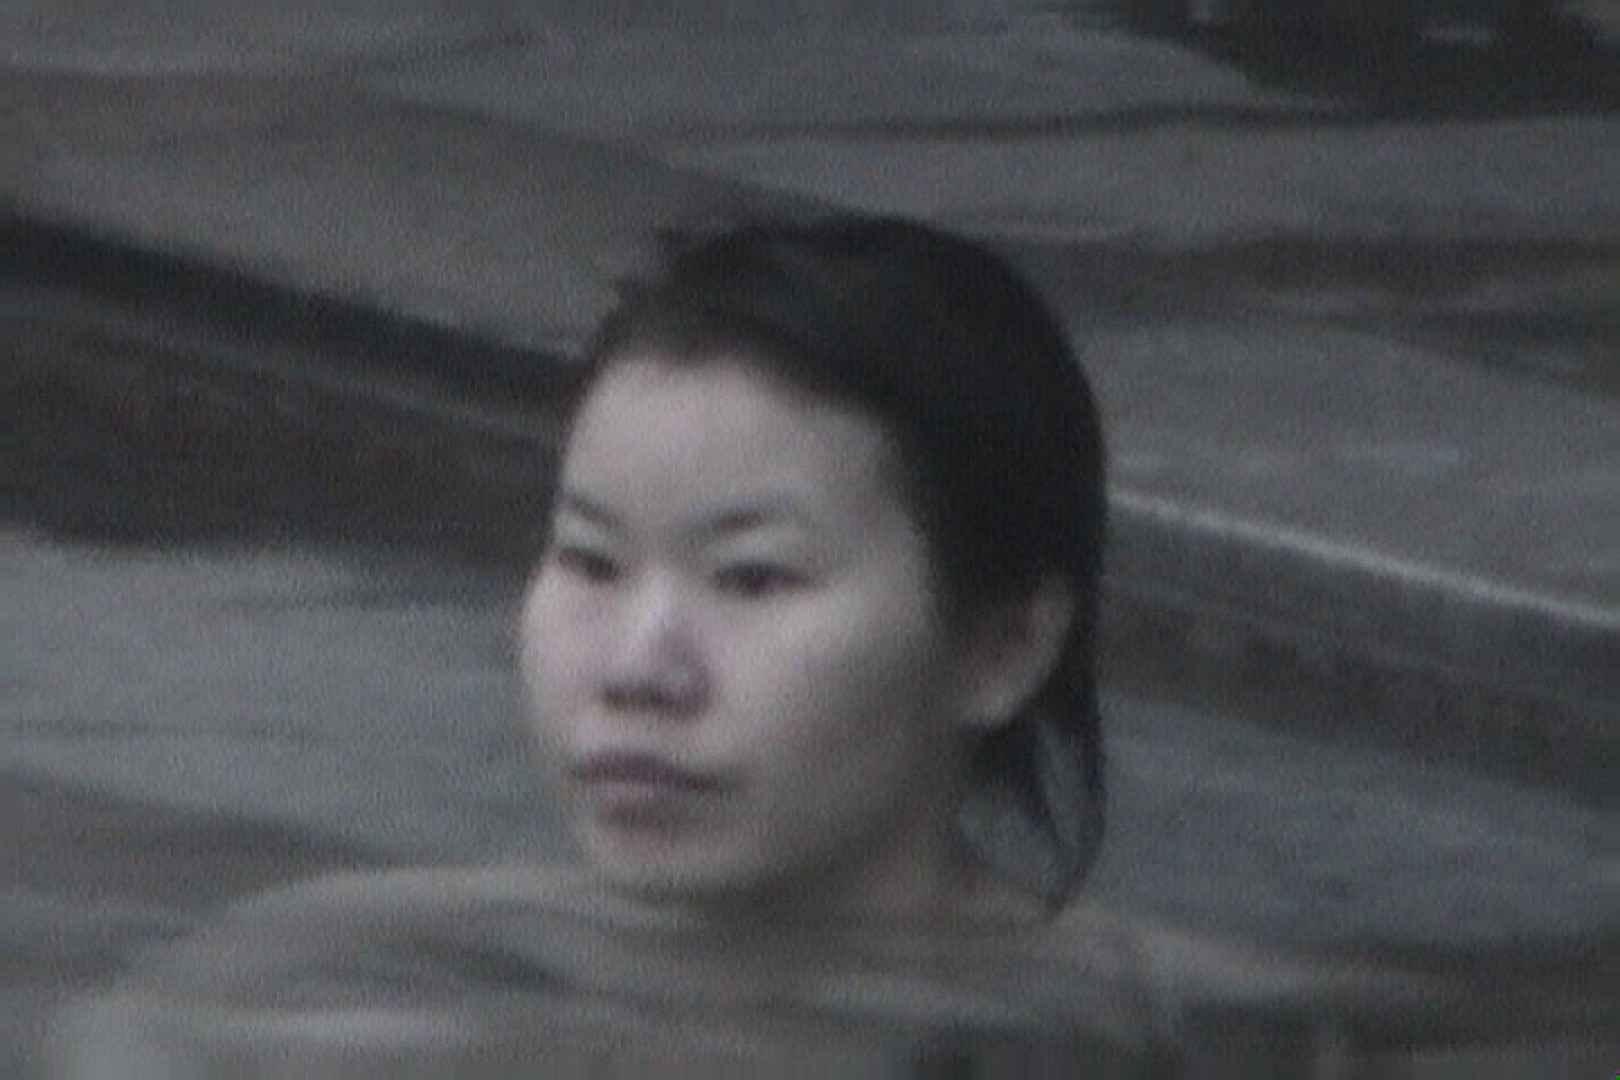 Aquaな露天風呂Vol.556 露天風呂編 | 盗撮シリーズ  99PIX 99